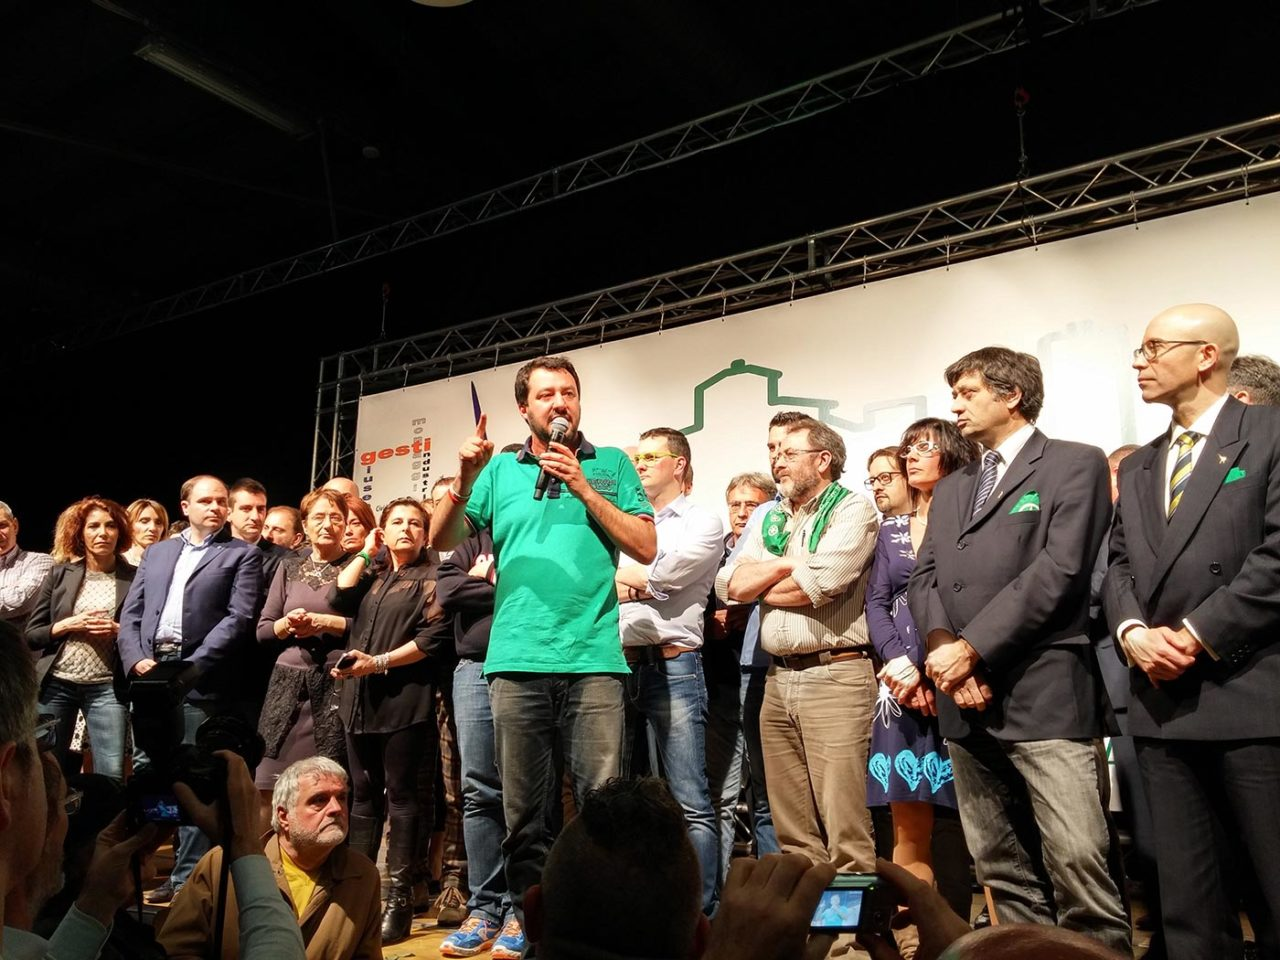 https://thesubmarine.it/wp-content/uploads/2017/01/Matteo_Salvini_-_Cena_di_gala_30°_anniversario_Lega_Nord_Bergamo-1280x960.jpg